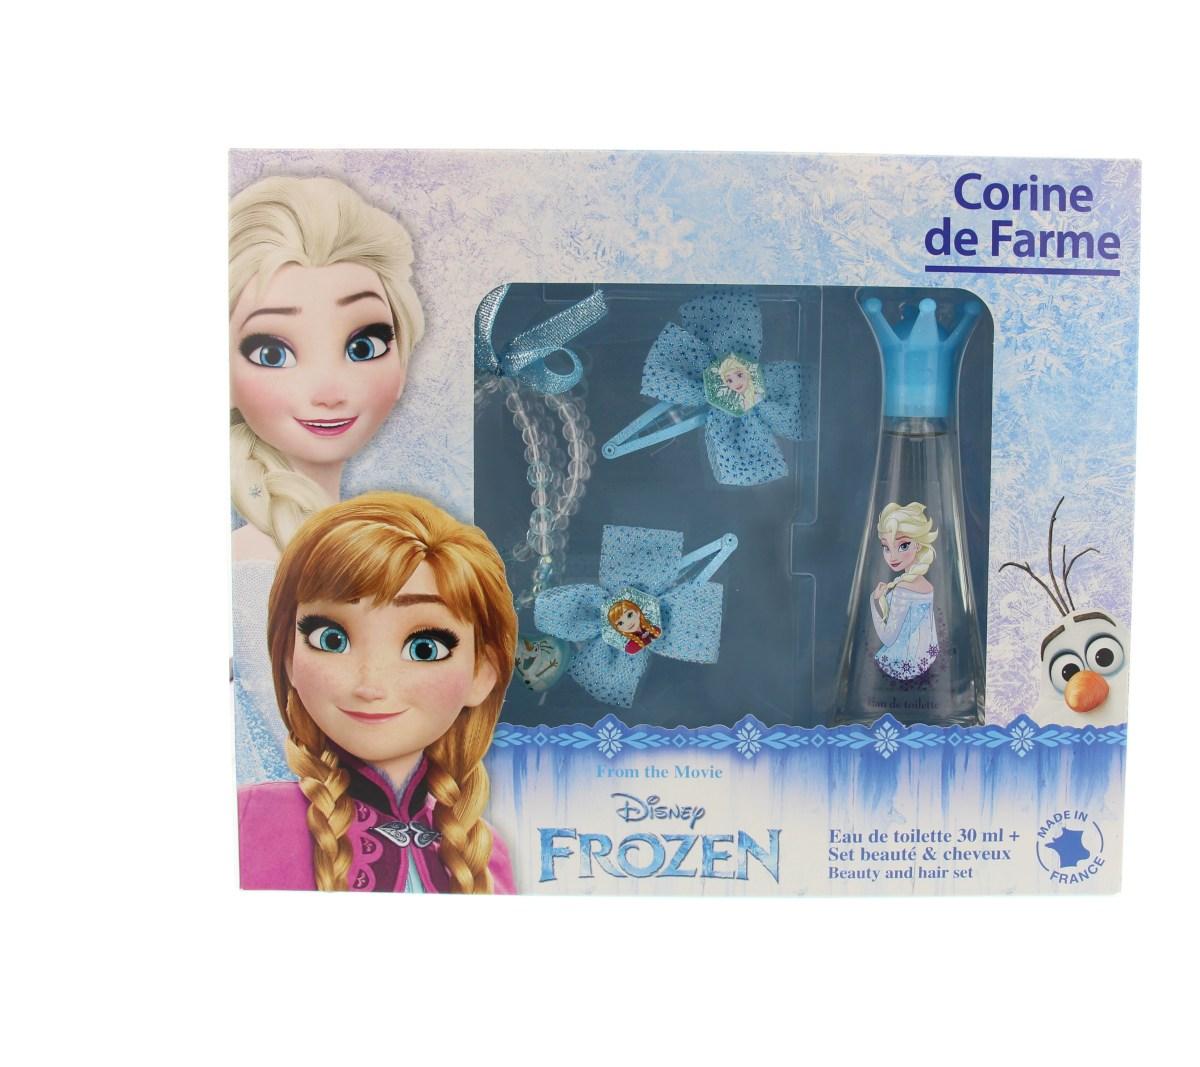 cdf-coffret_pfa_frozen-va01-r-hd